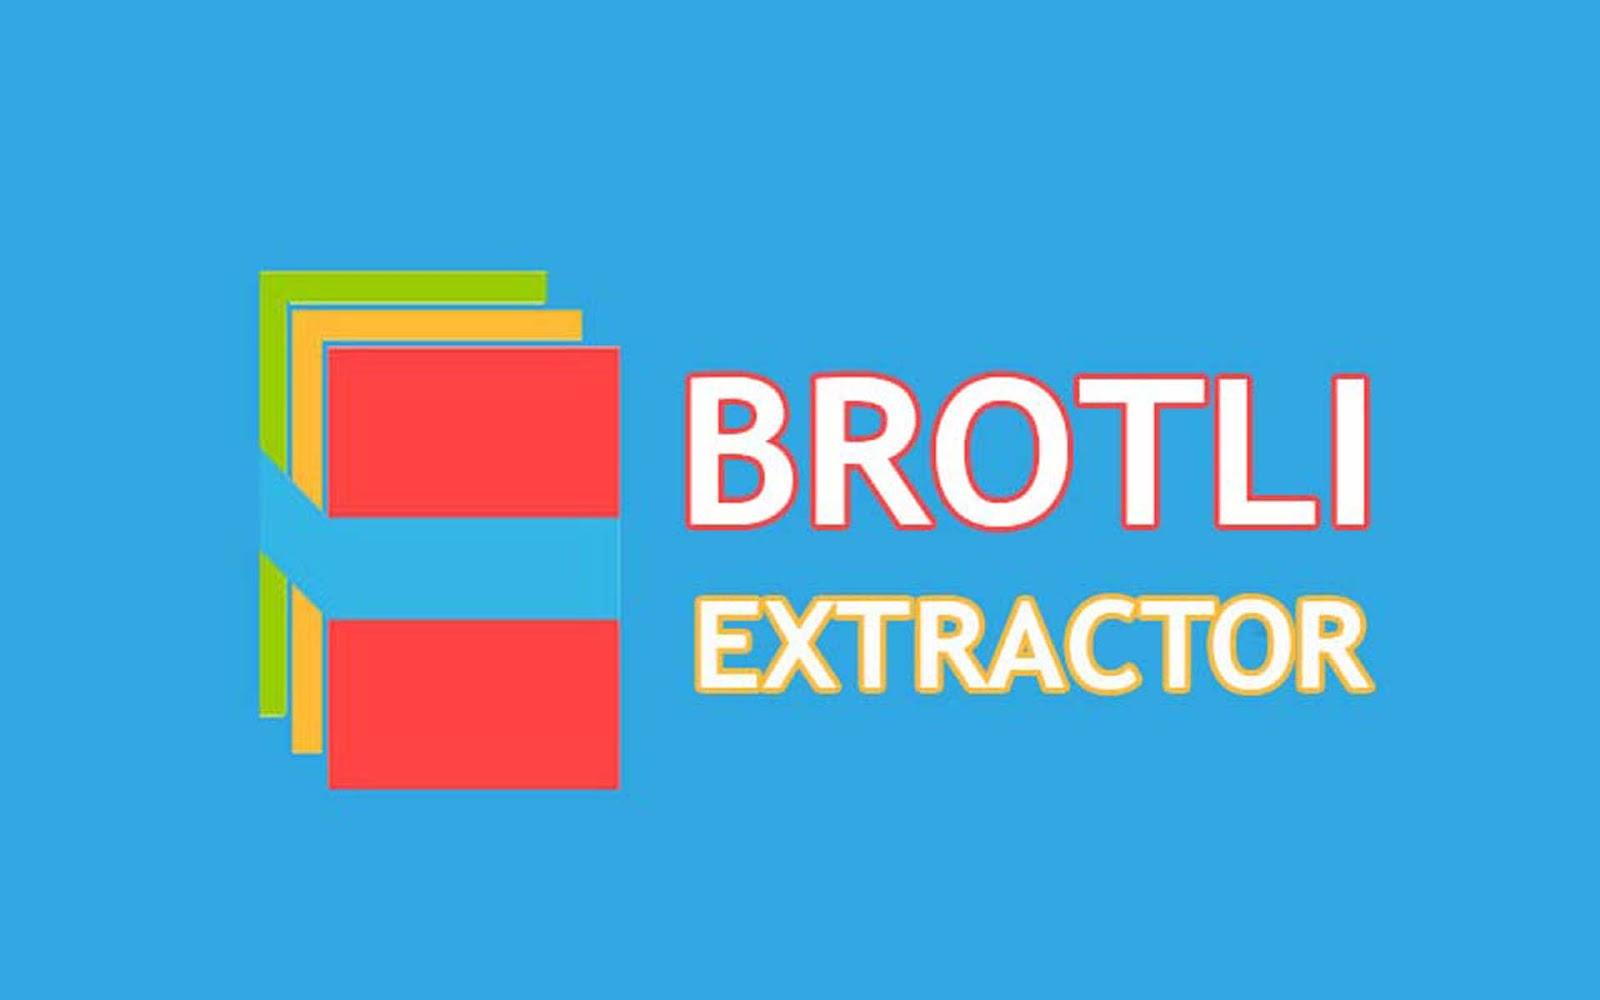 Brotli Extractor